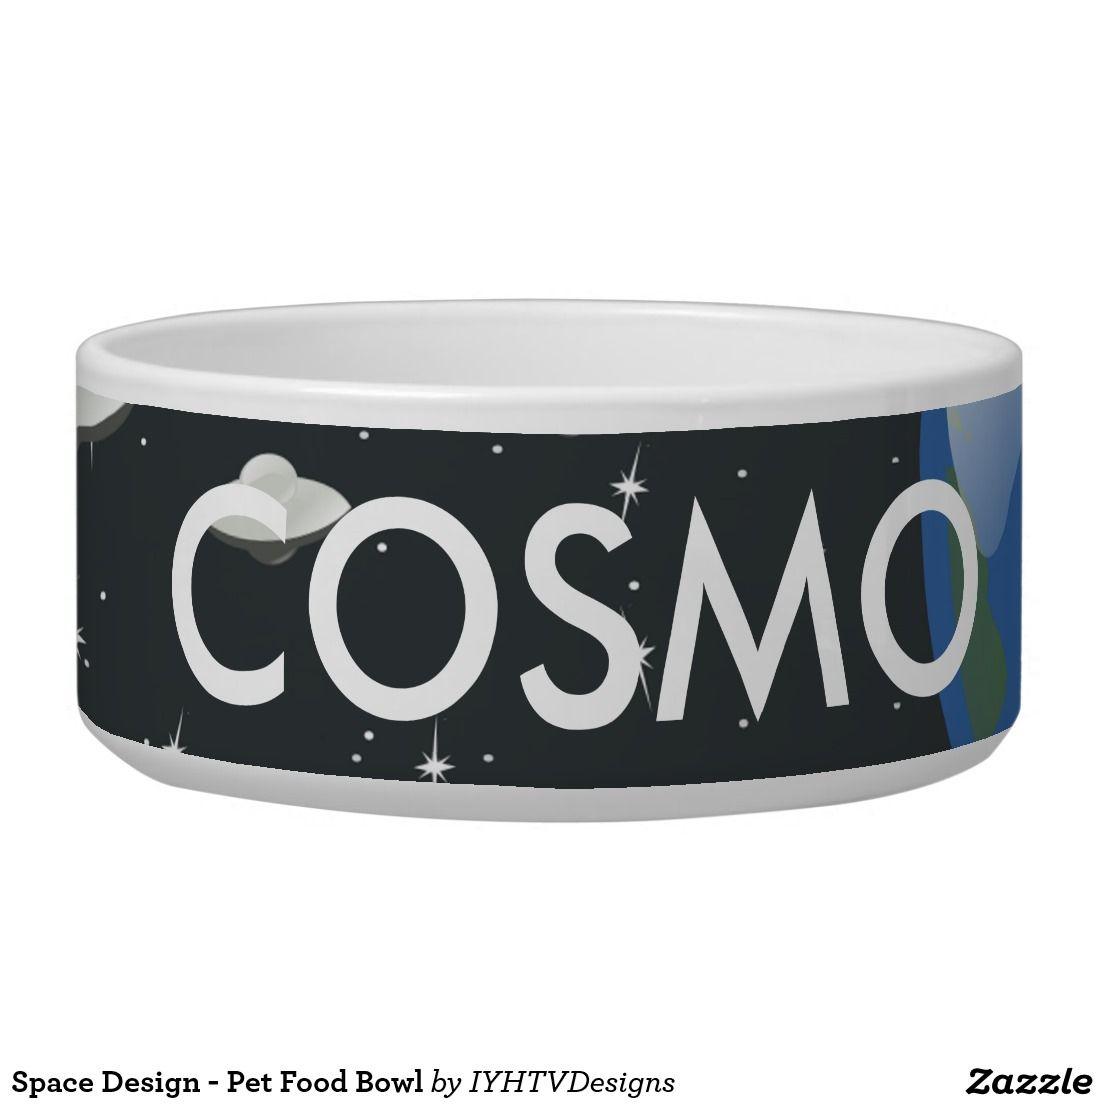 Space Design - Pet Food Bowl